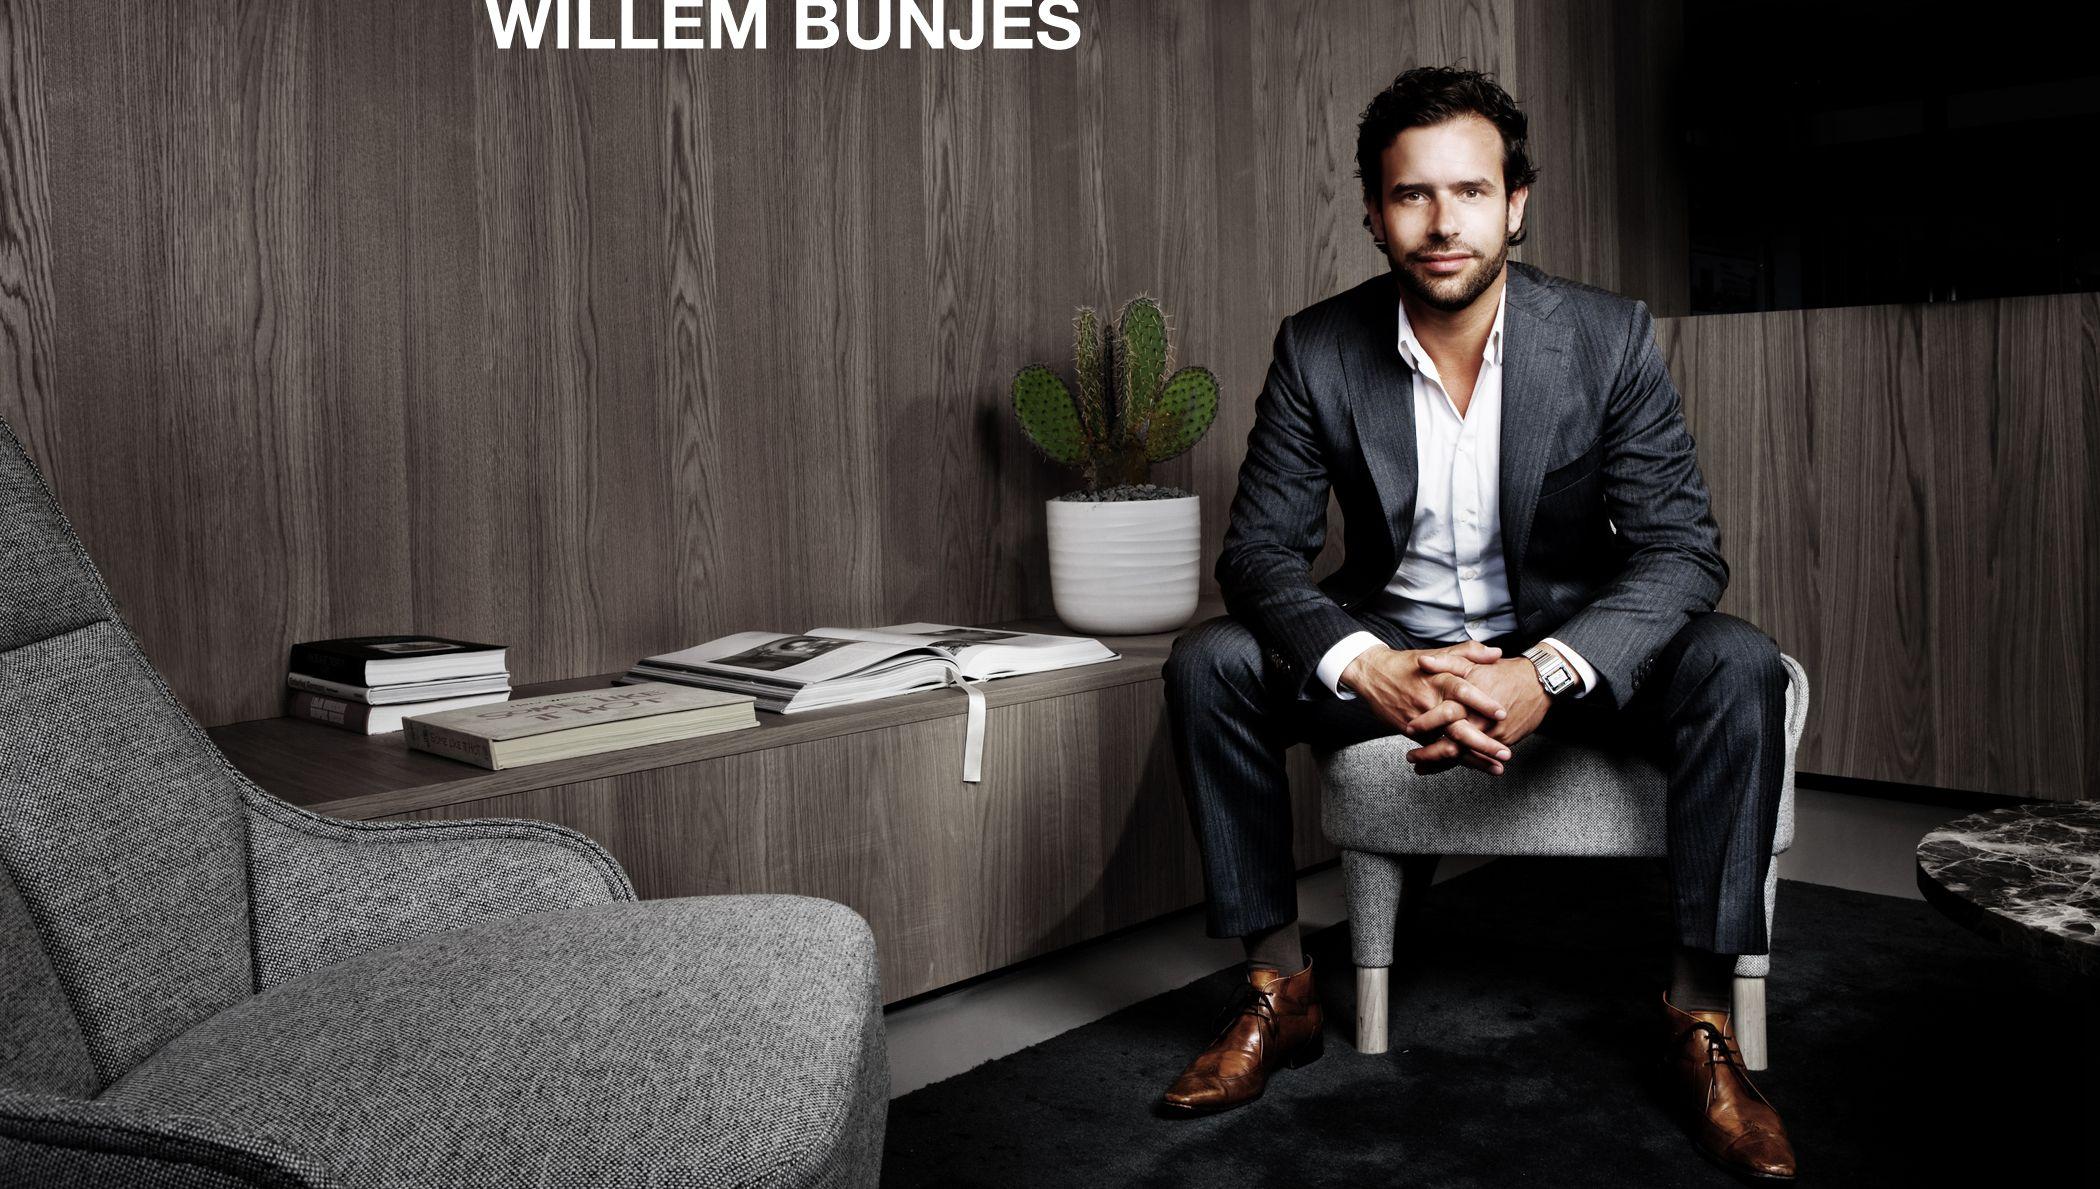 Willem Bunjes